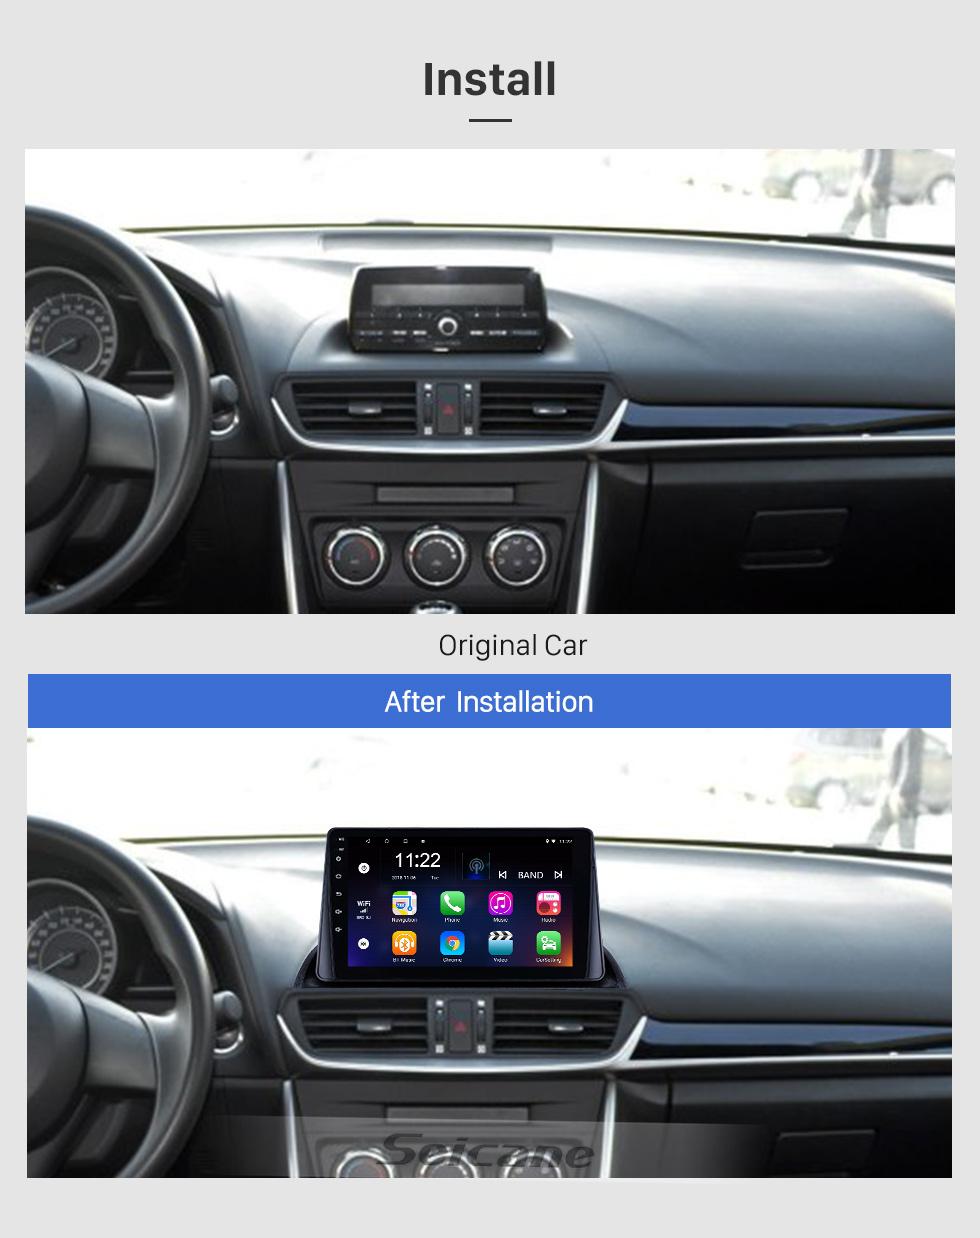 Seicane 9 pulgadas 8 Núcleo Android 8.1 2014 2015 2016 2017 MAZDA CX-4 Radio Sistema de navegación GPS con pantalla táctil de alta definición USB 3G WIFI Bluetooth Soporte de música OBD2 Mirror Link Digital TV